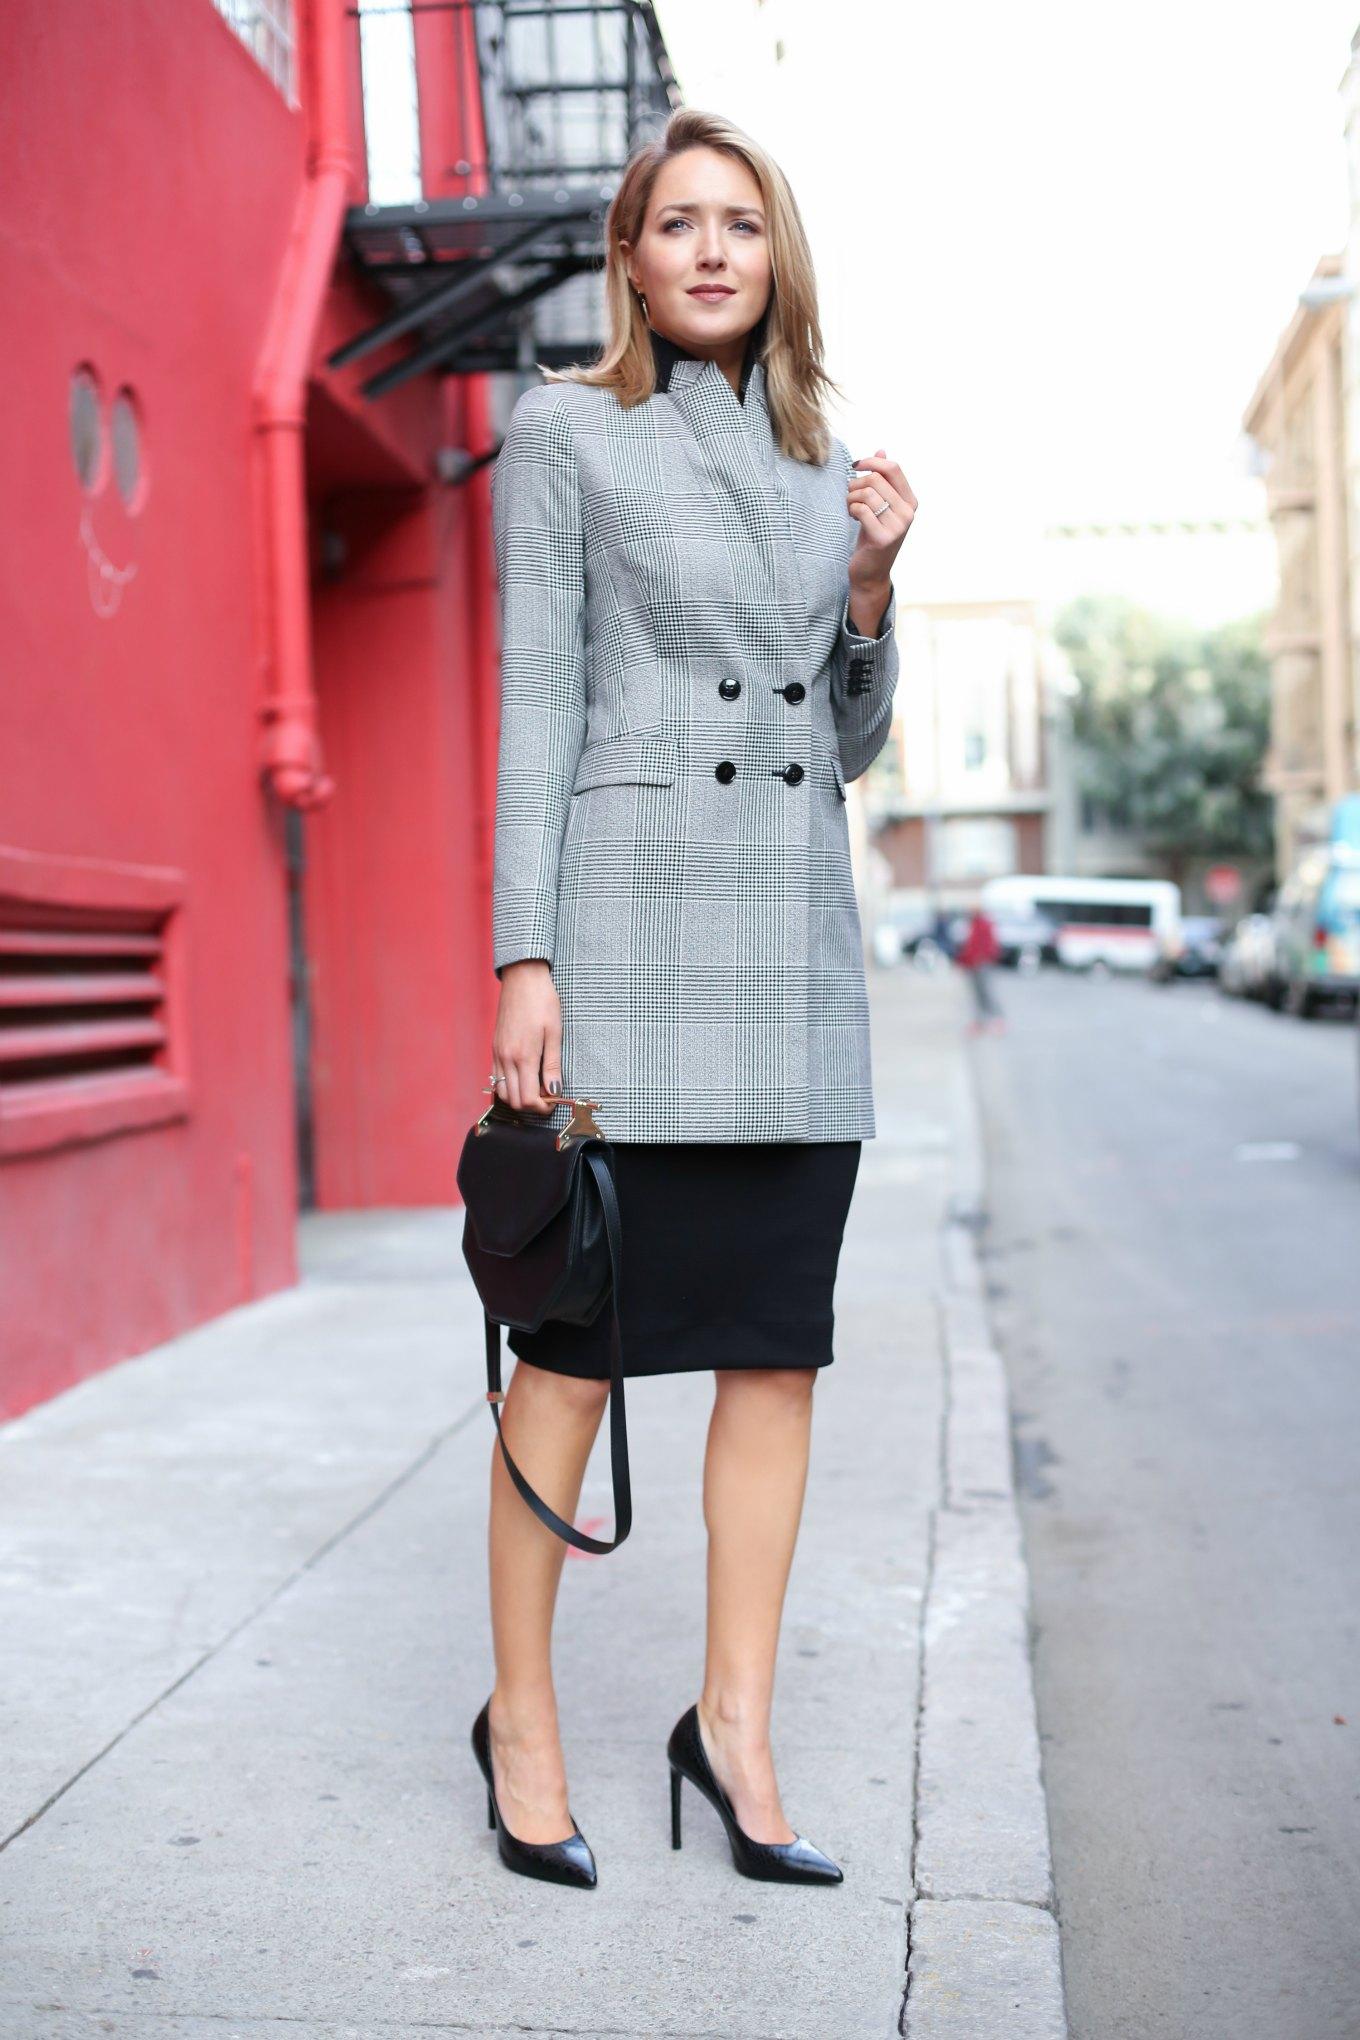 dress-the-population-strappy-black-sheath-cocktail-dress-glen-plaid-double-breasted-blazer-work-desk-to-drinks-day-to-night-fashion-style-blog-sf-memorandum-mary-orton3